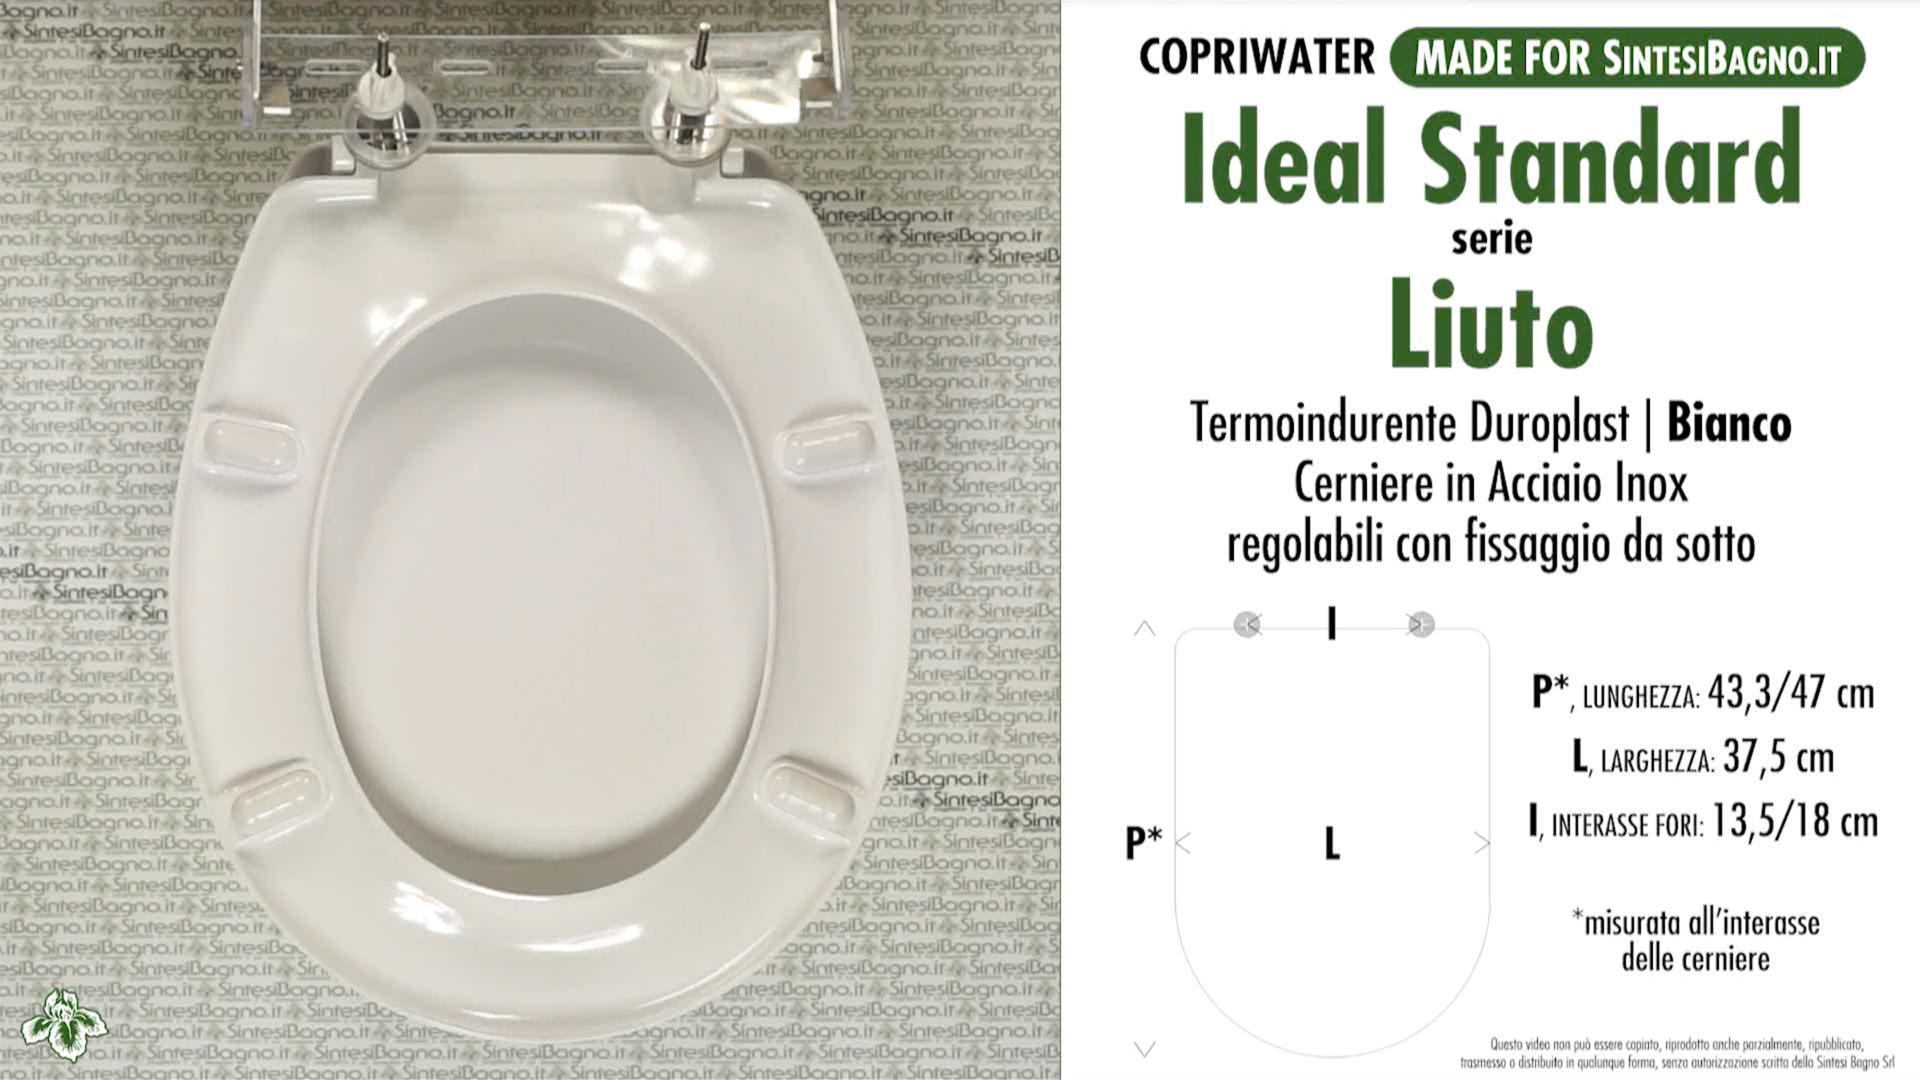 Sedile Wc Ideal Standard Liuto.Copriwater Per Wc Liuto Ideal Standard Ricambio Dedicato Duroplast Sintesibagno Shop Online